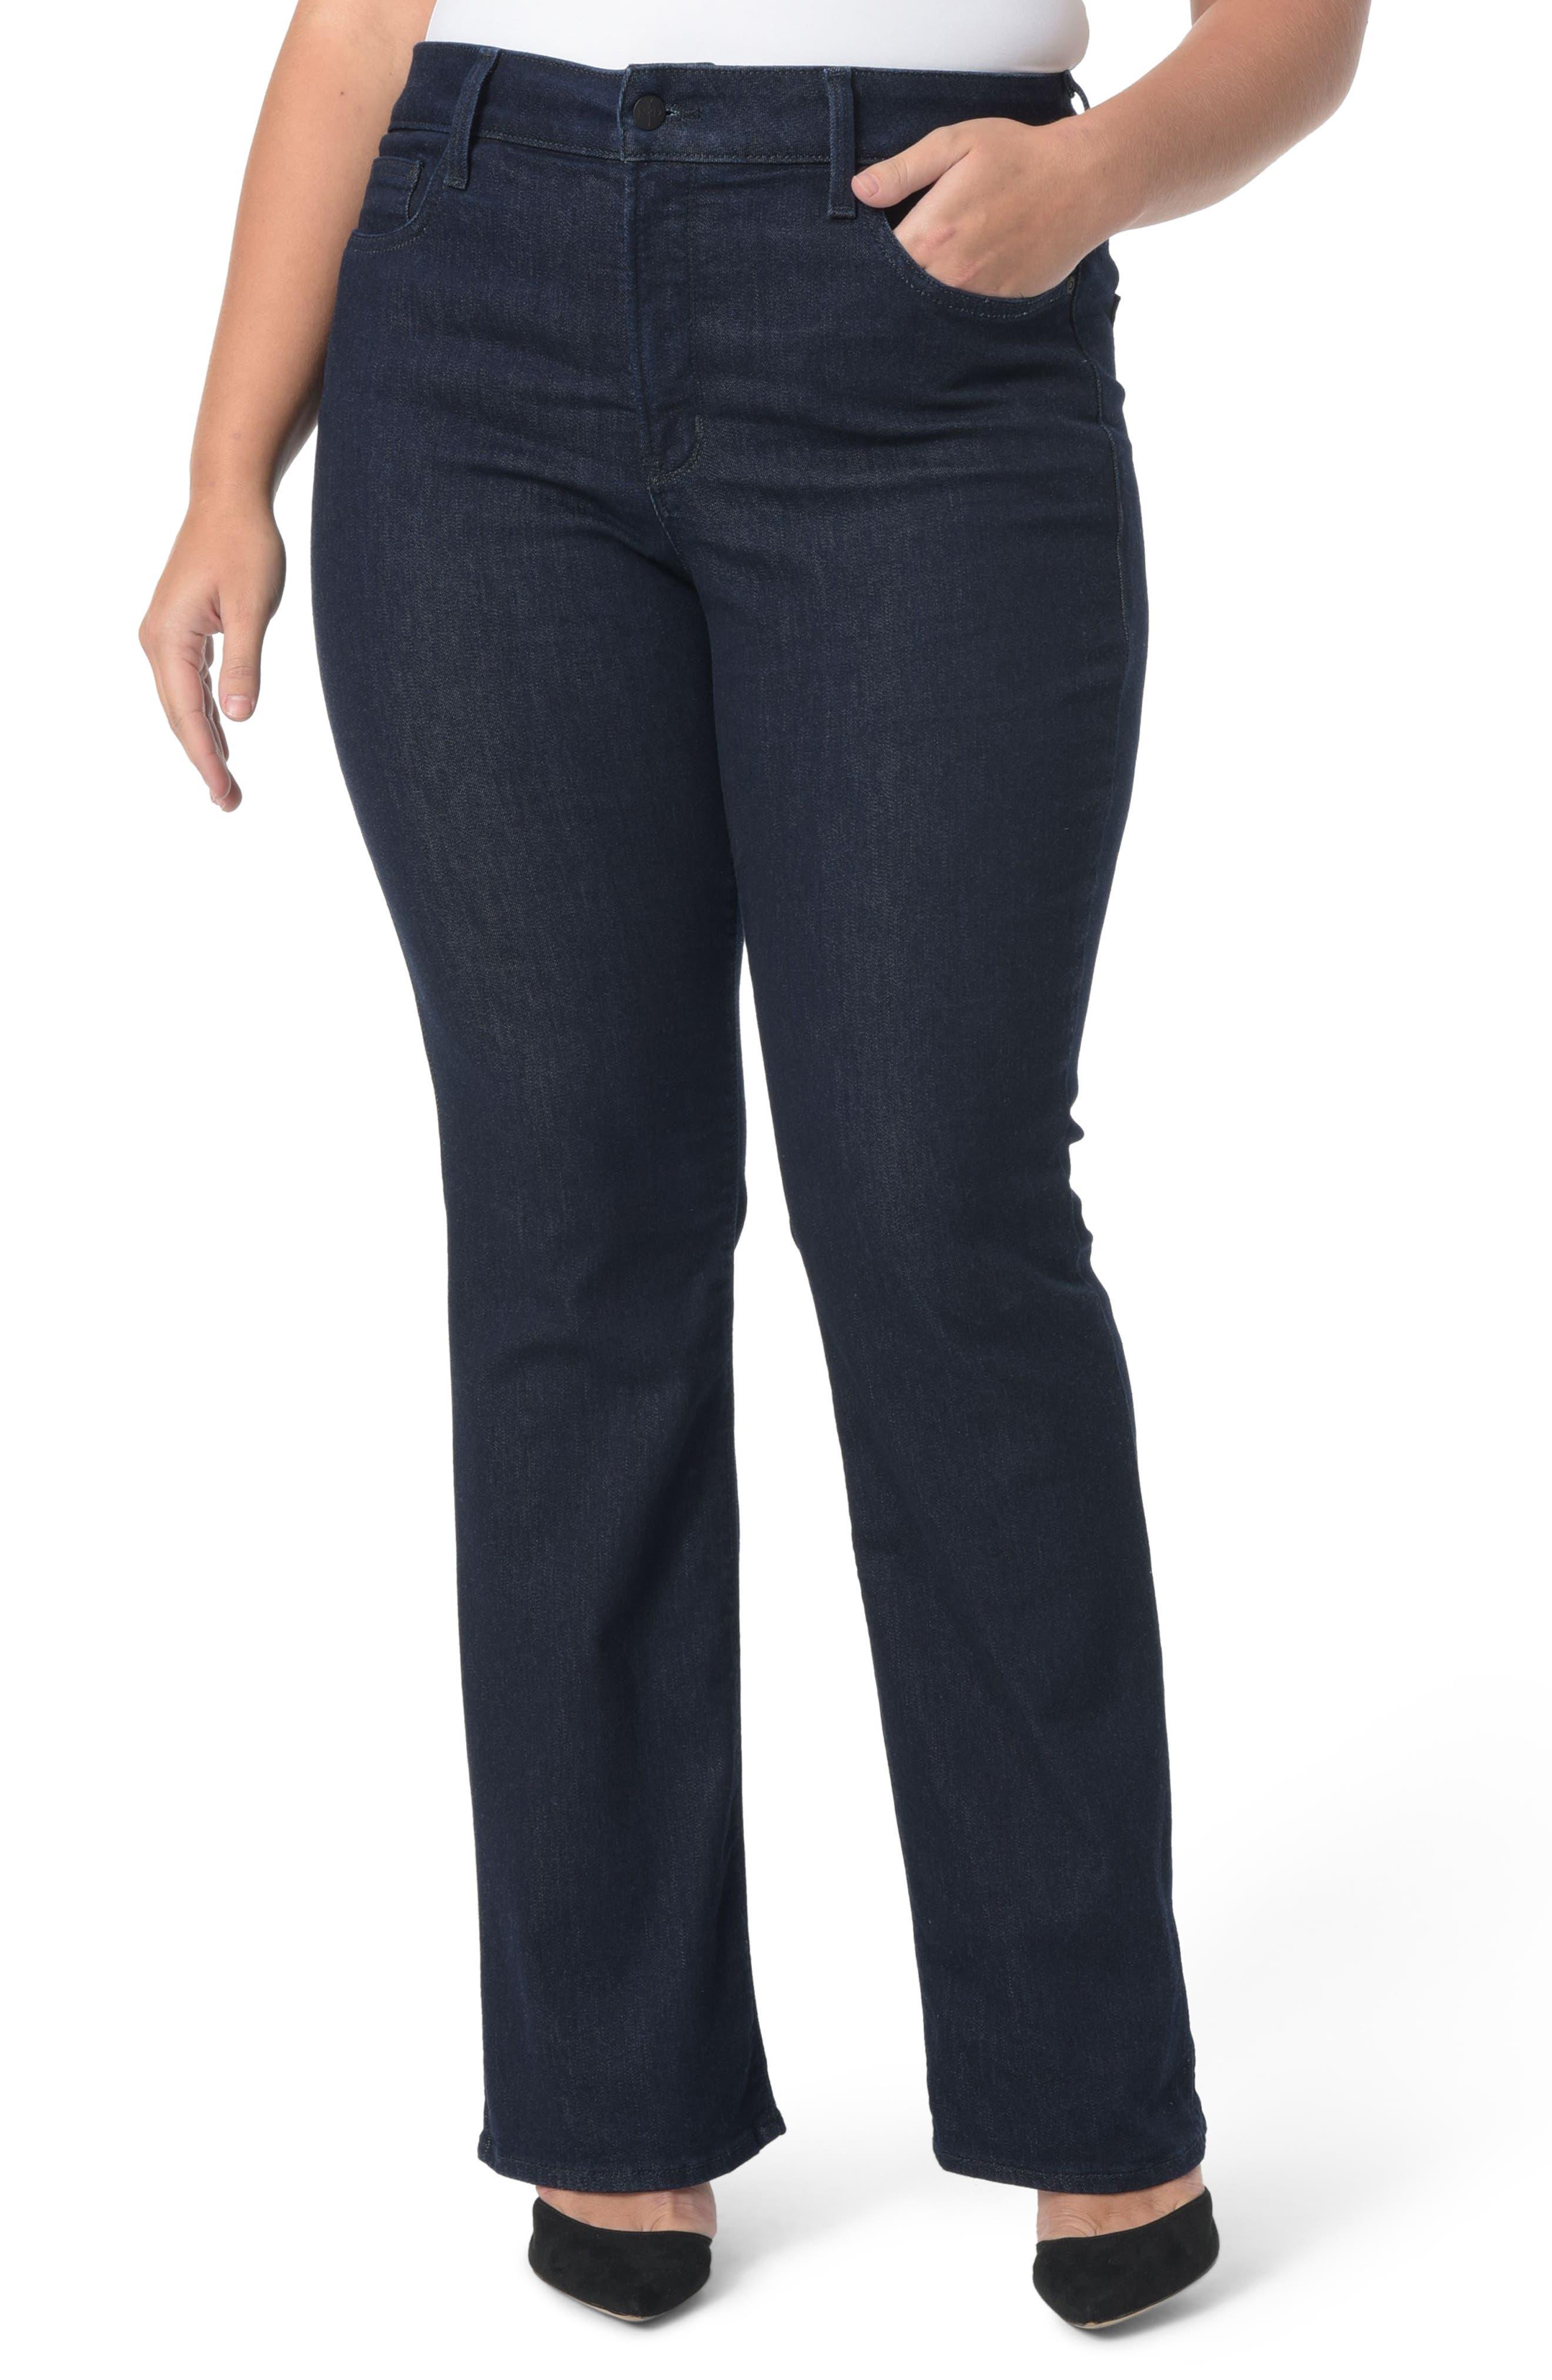 Barbara Stretch Bootcut Jeans,                             Main thumbnail 1, color,                             RINSE TONAL STITCH